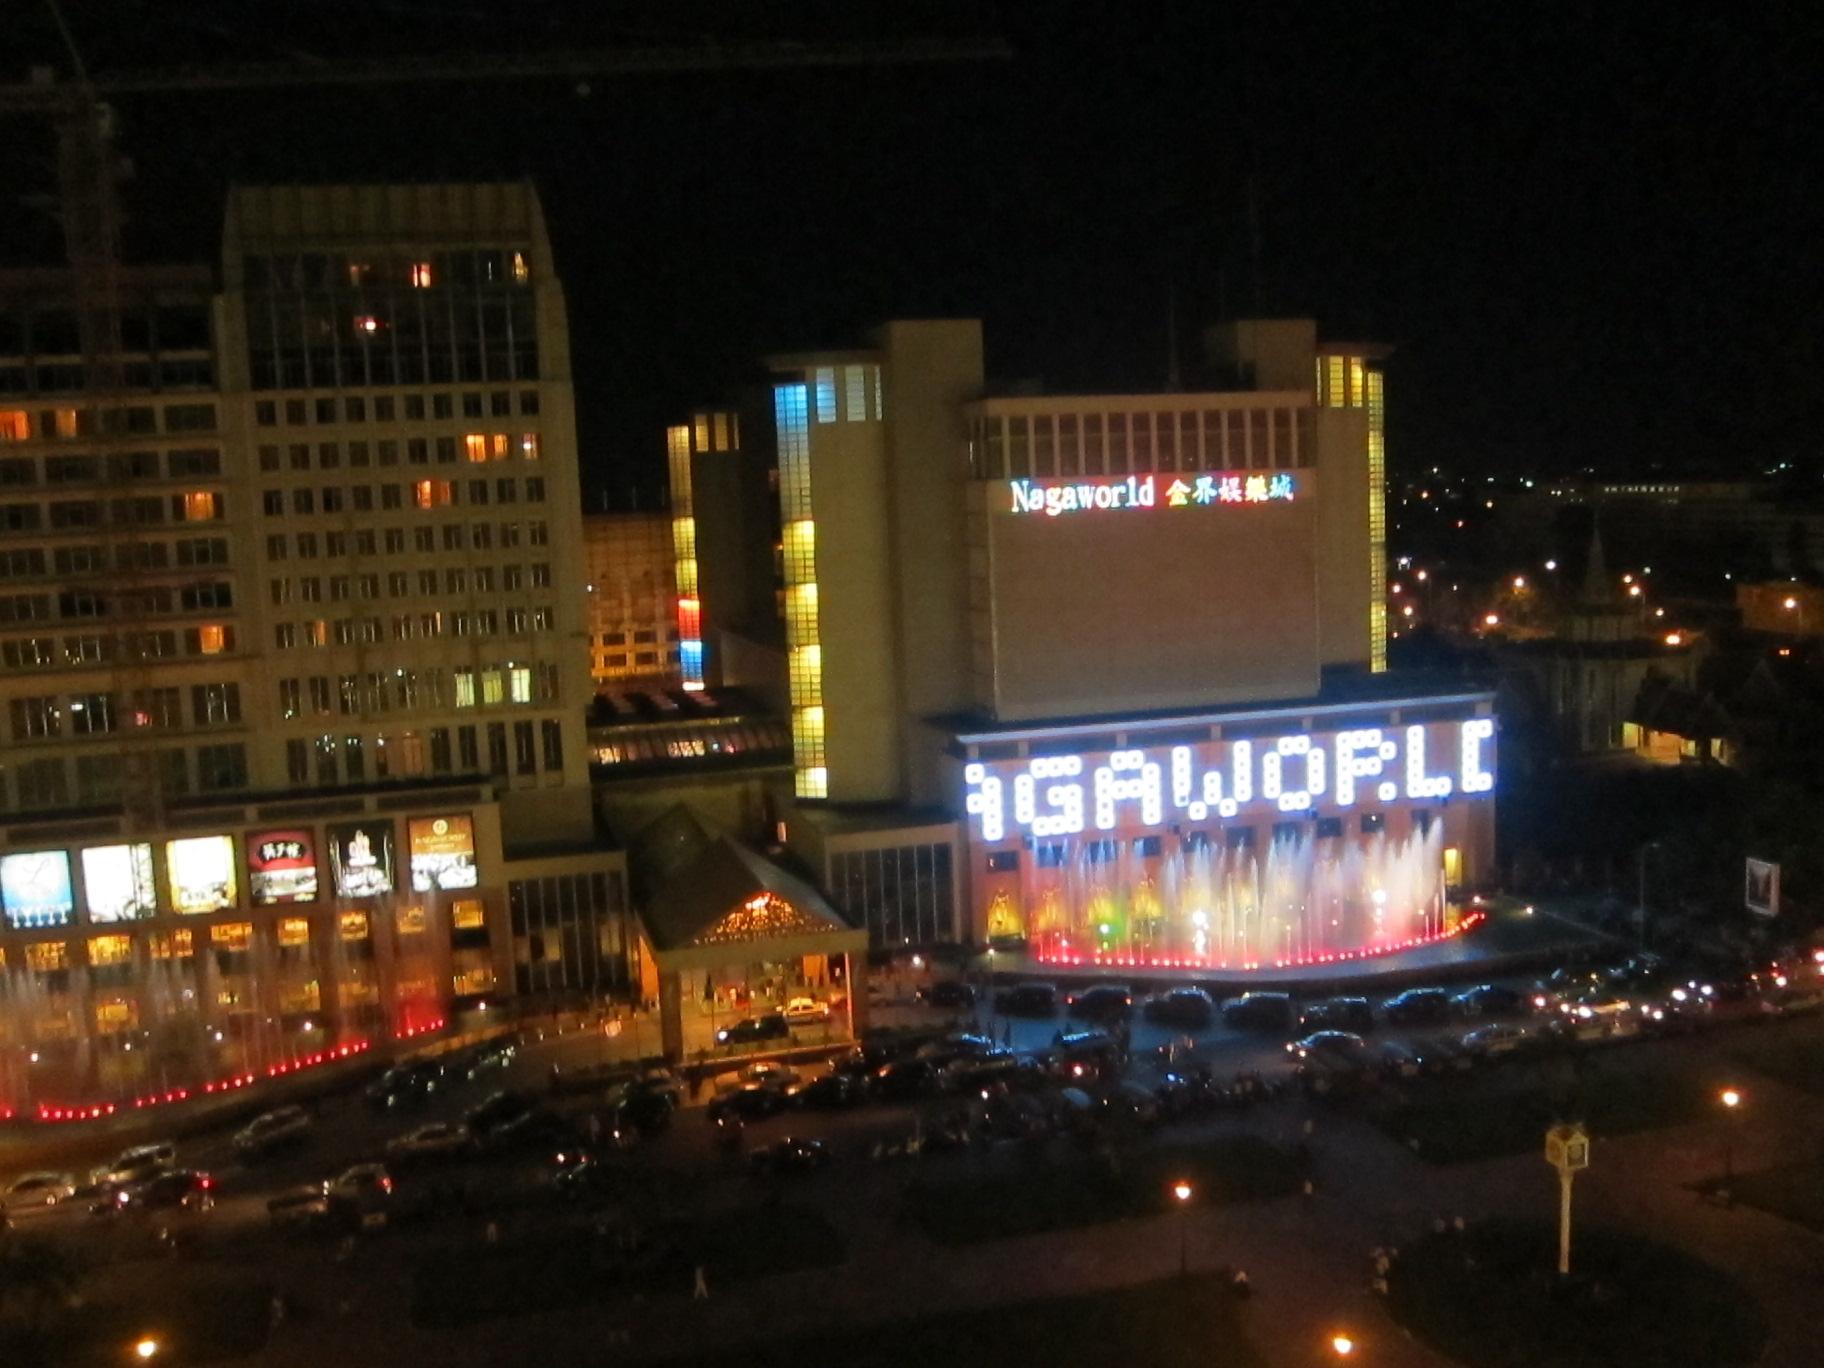 Nagaworld phnom penh casino